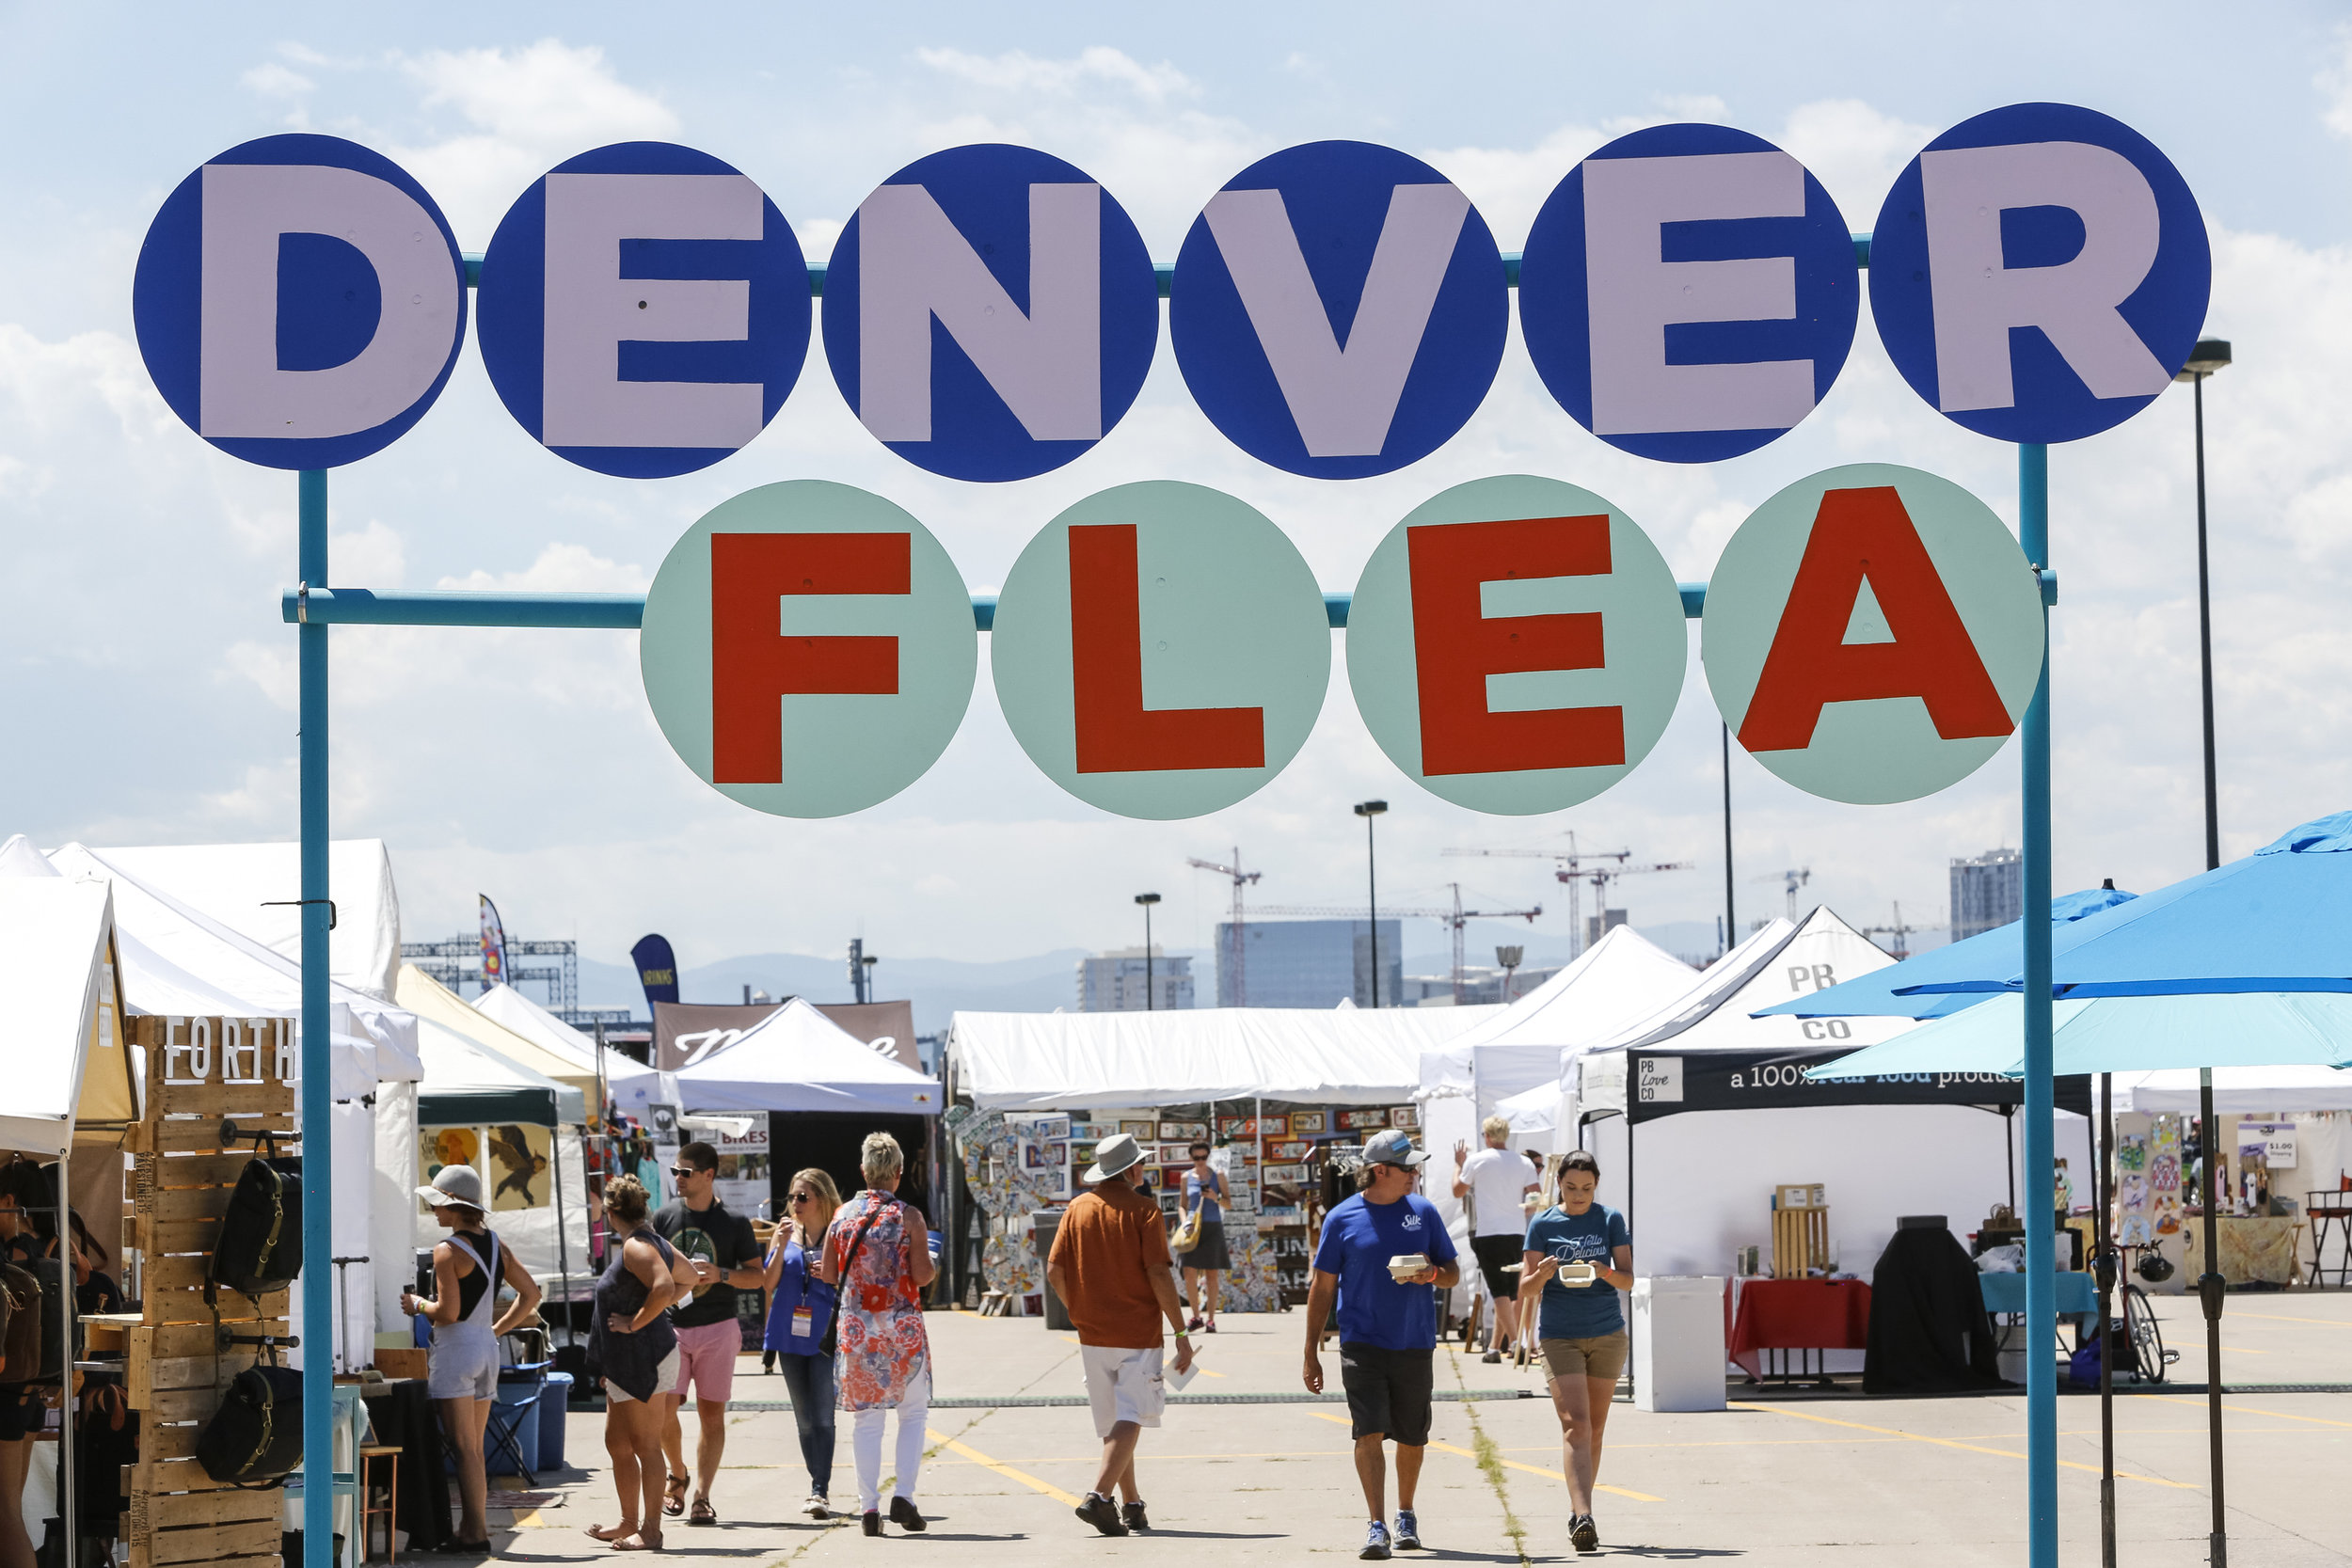 DenverVeloramaFlea_9481.jpg